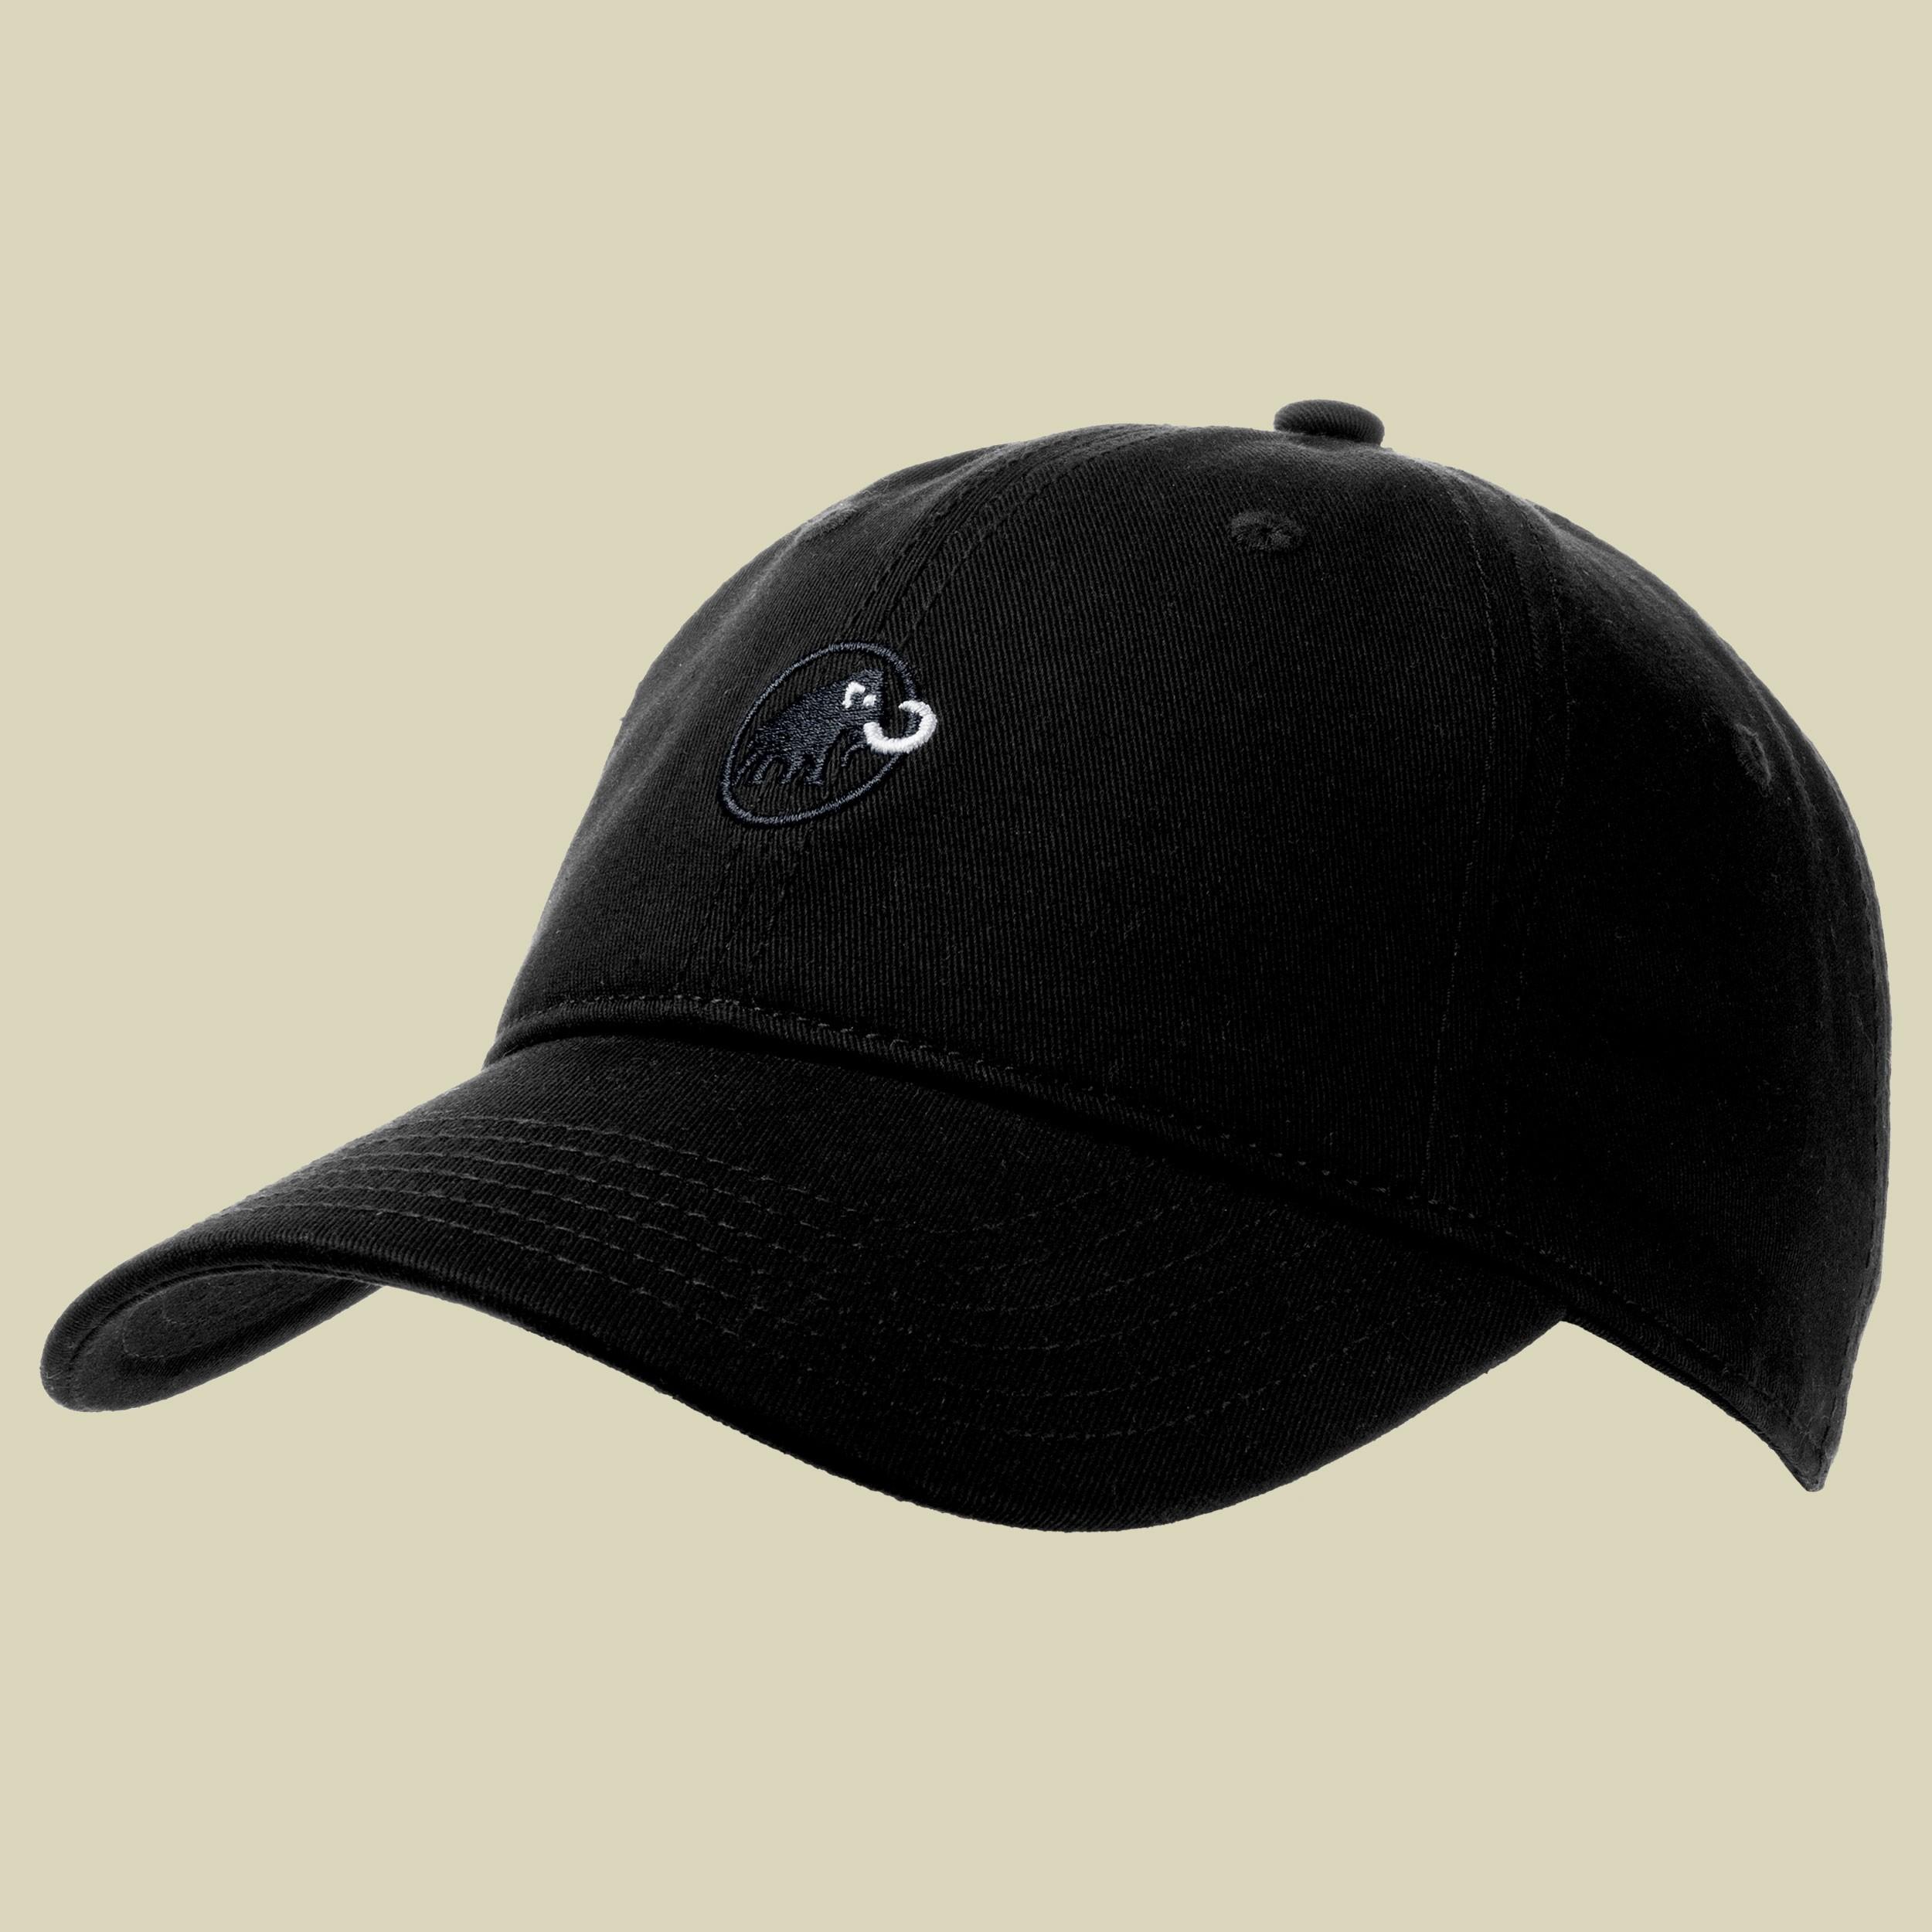 Baseballkappe Mütze Kinder Basecap Atmungsaktiv Winddicht RESULT 084 NEU